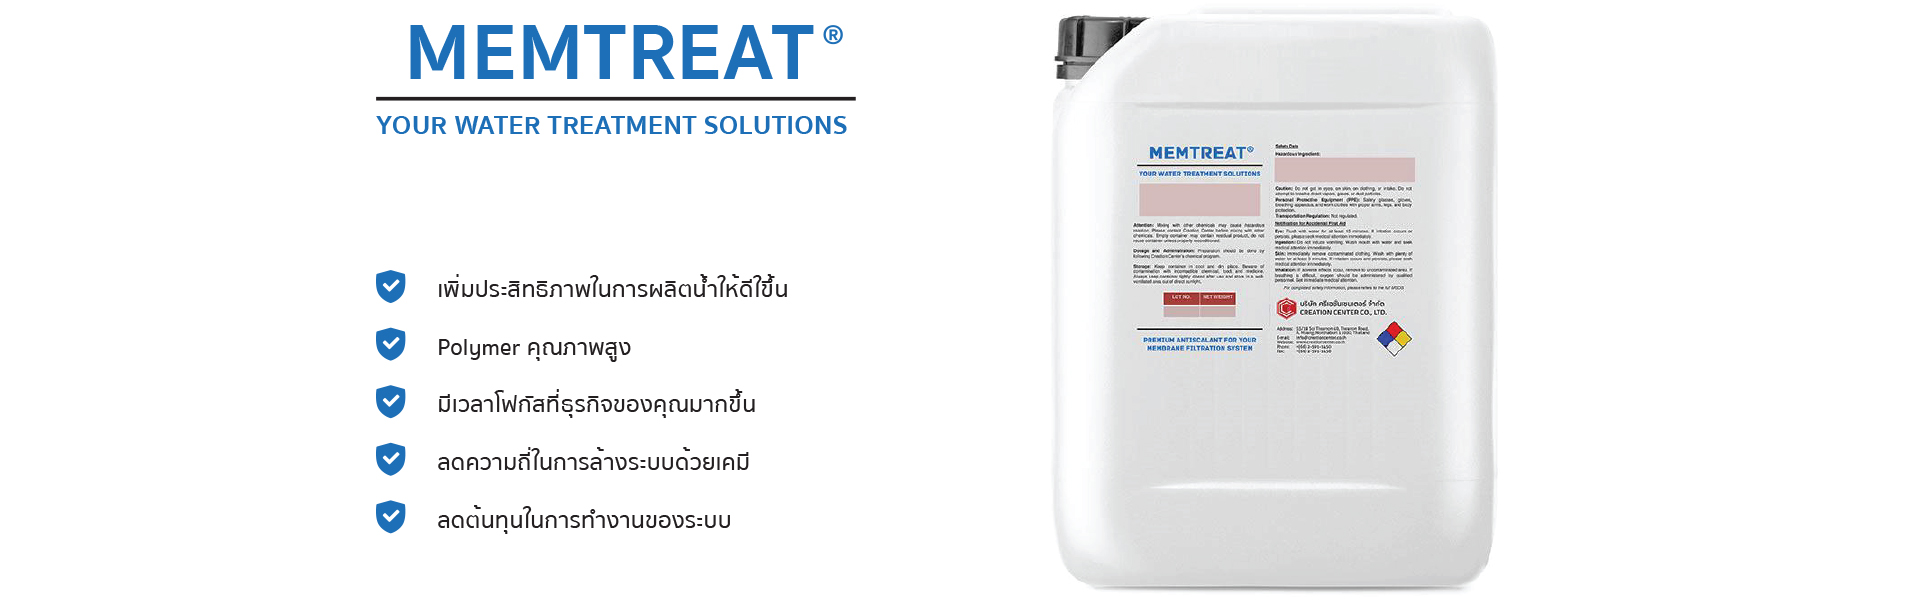 Memtreat เคมีป้องกันตะกรันสำหรับระบบ RO